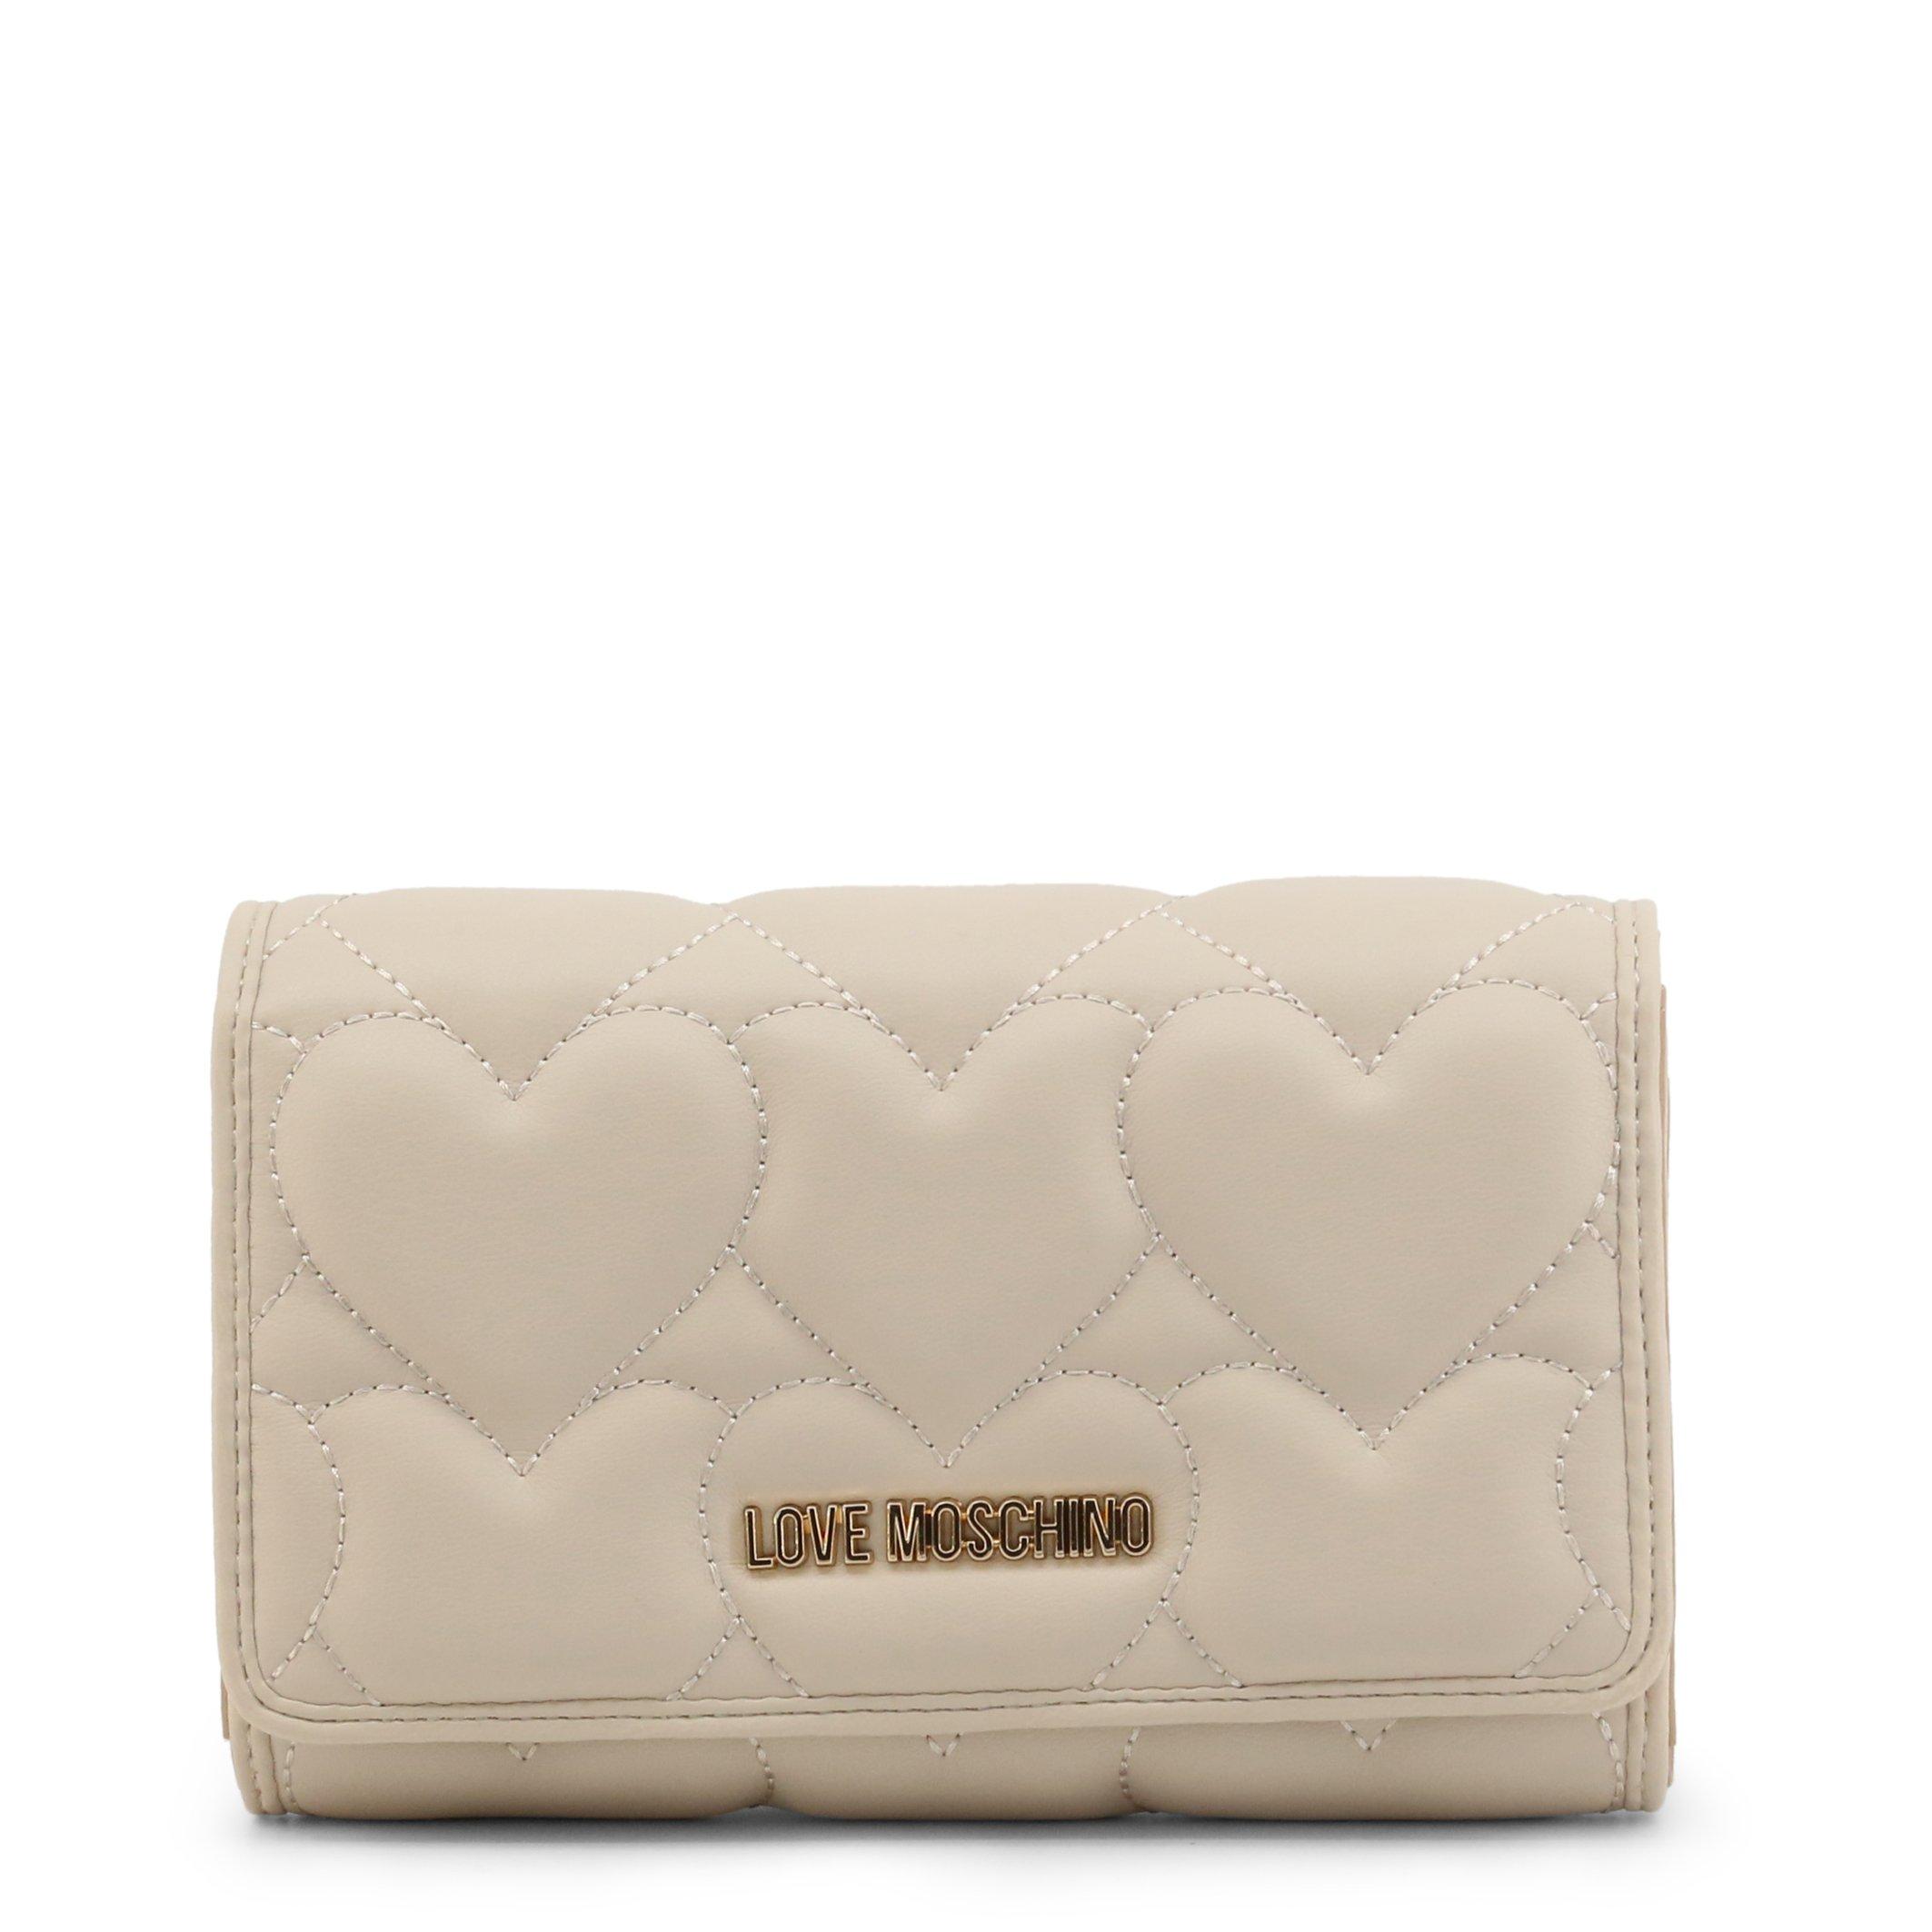 Love Moschino Women's Wallet Various Colours JC5633PP0CKG0 - white NOSIZE